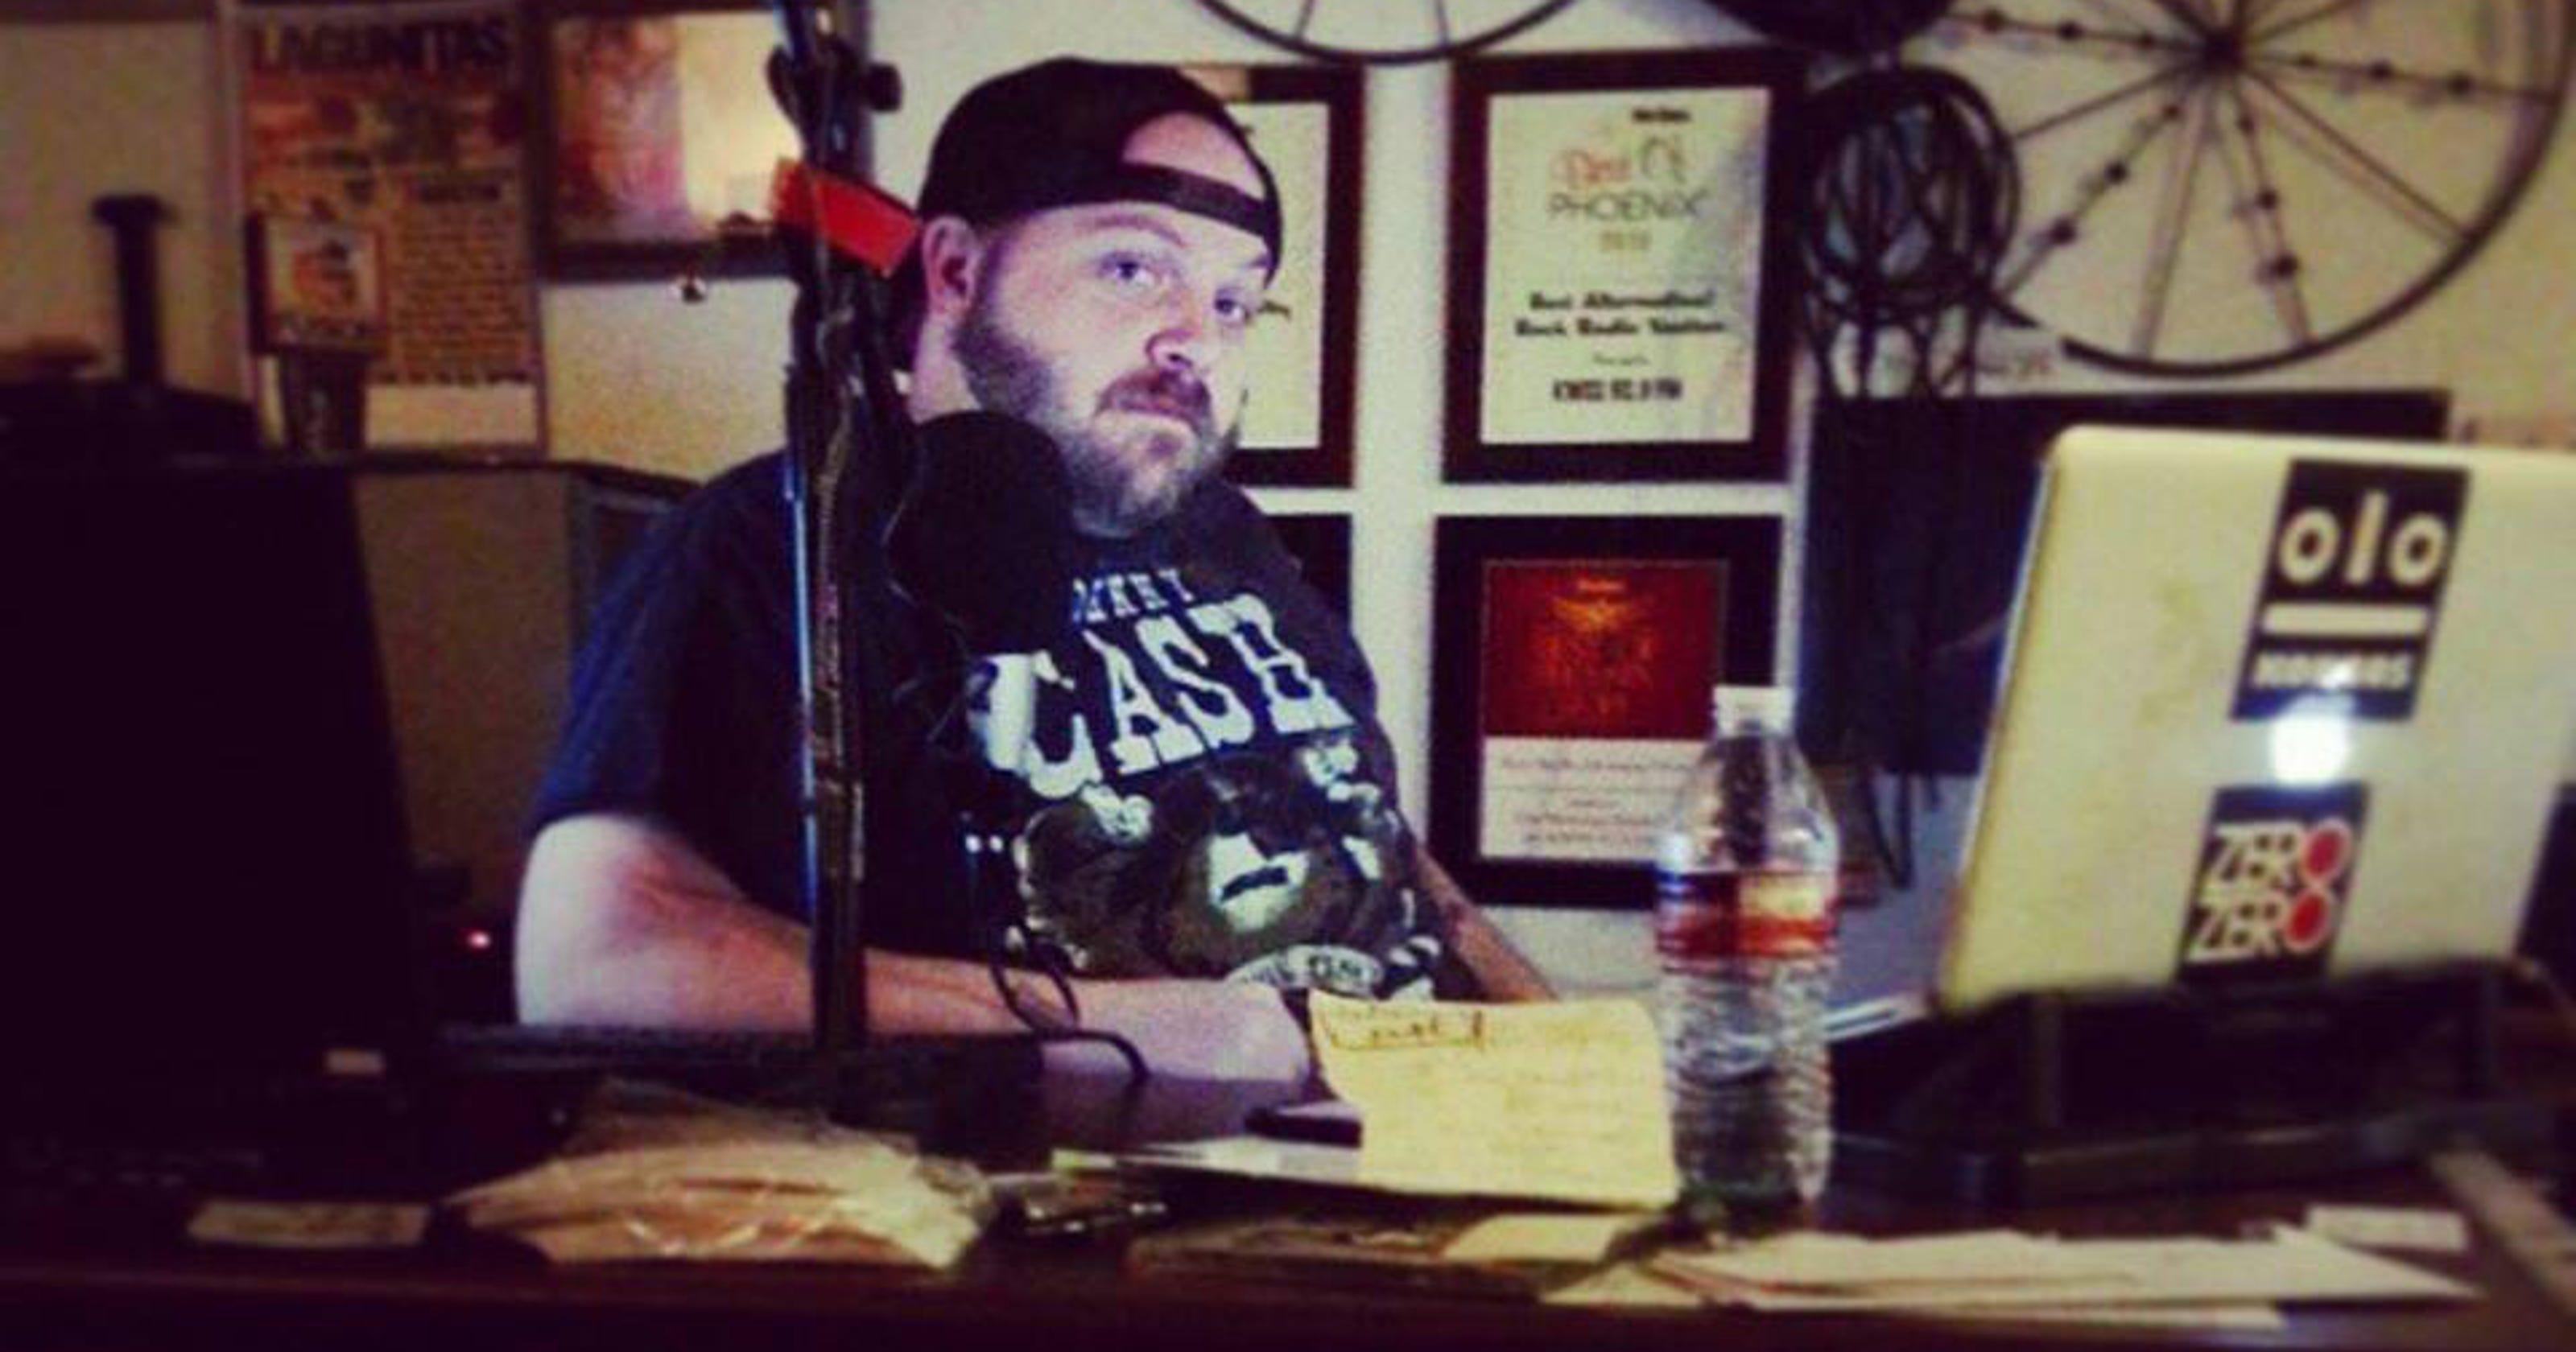 Beef Vegan, local rockers celebrate his anniversary live on KWSS